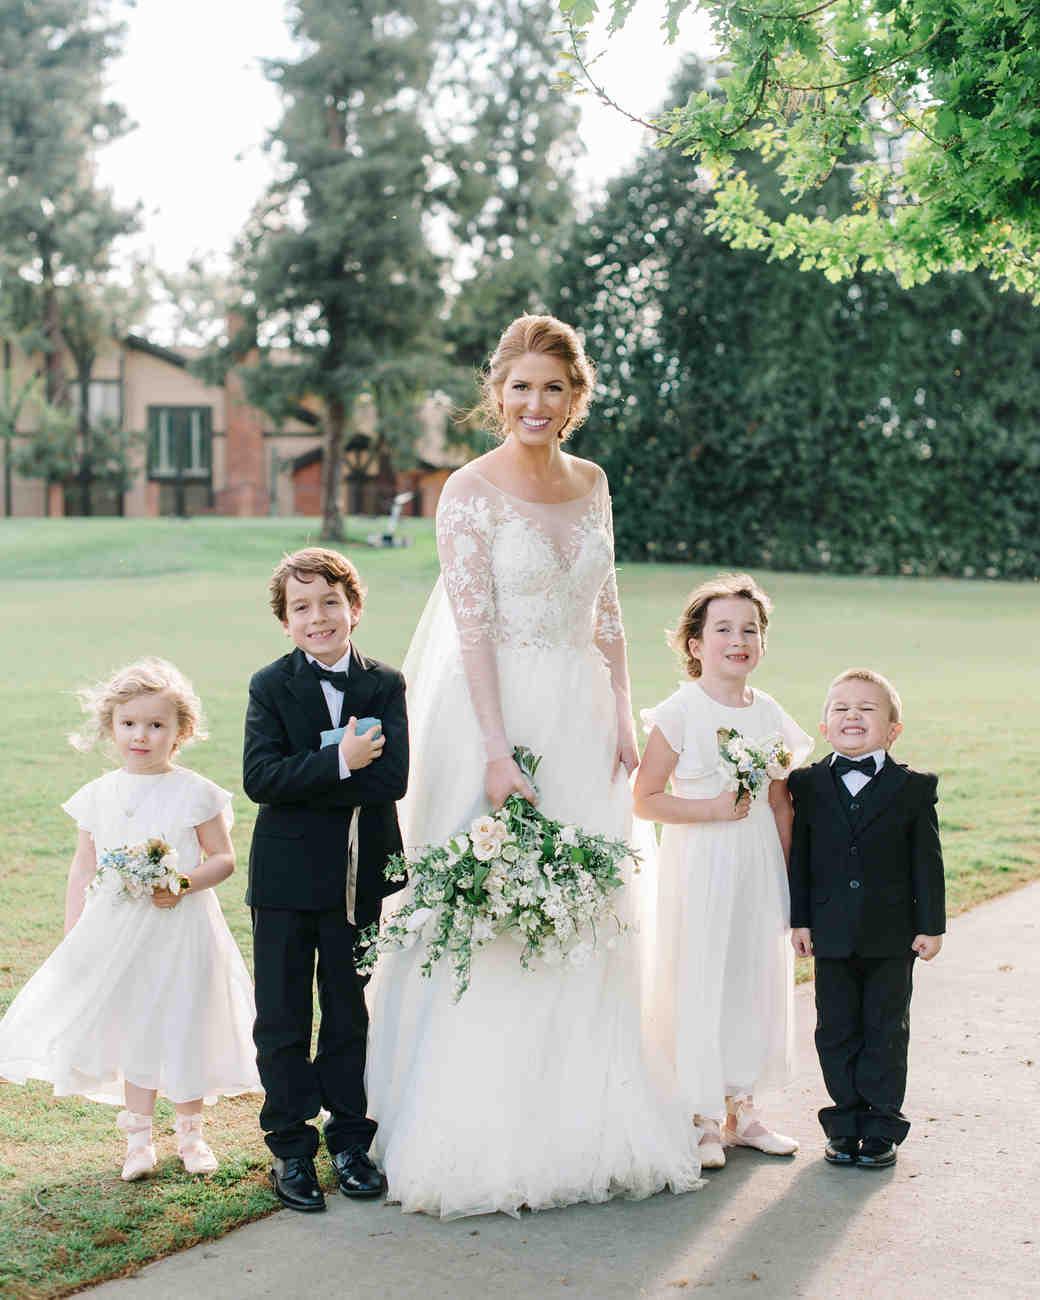 wedding kids with bride